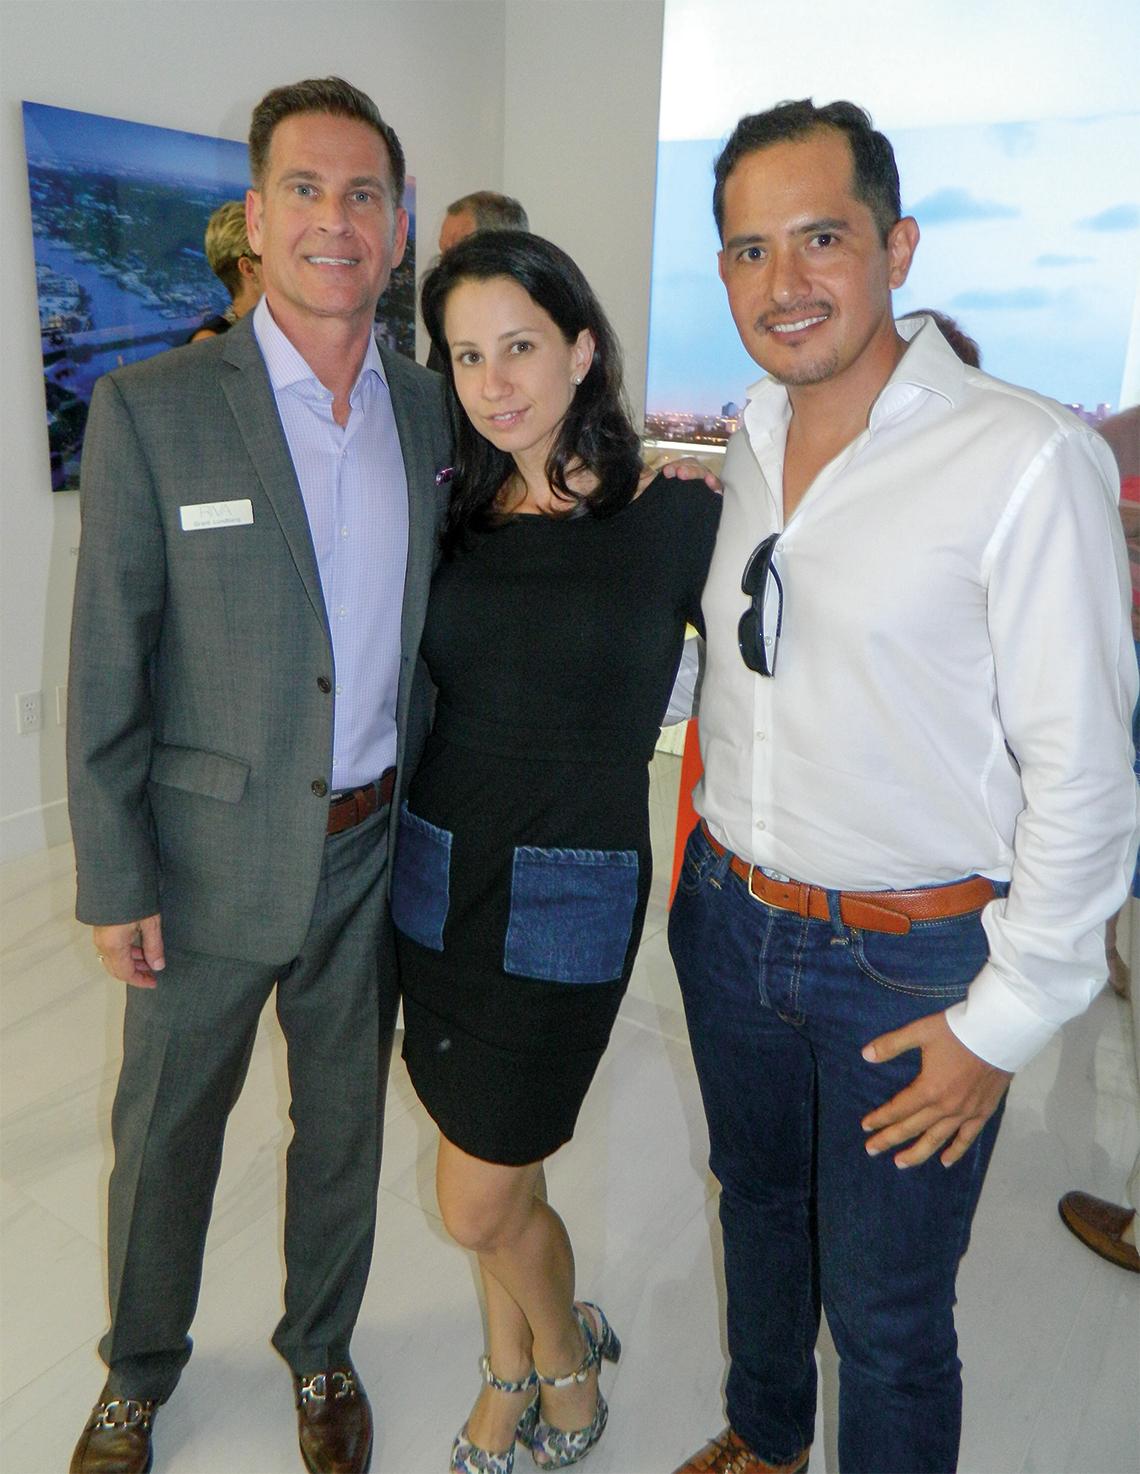 Grant Lundberg, Dayana Susterman and Windsor Rodriguez.